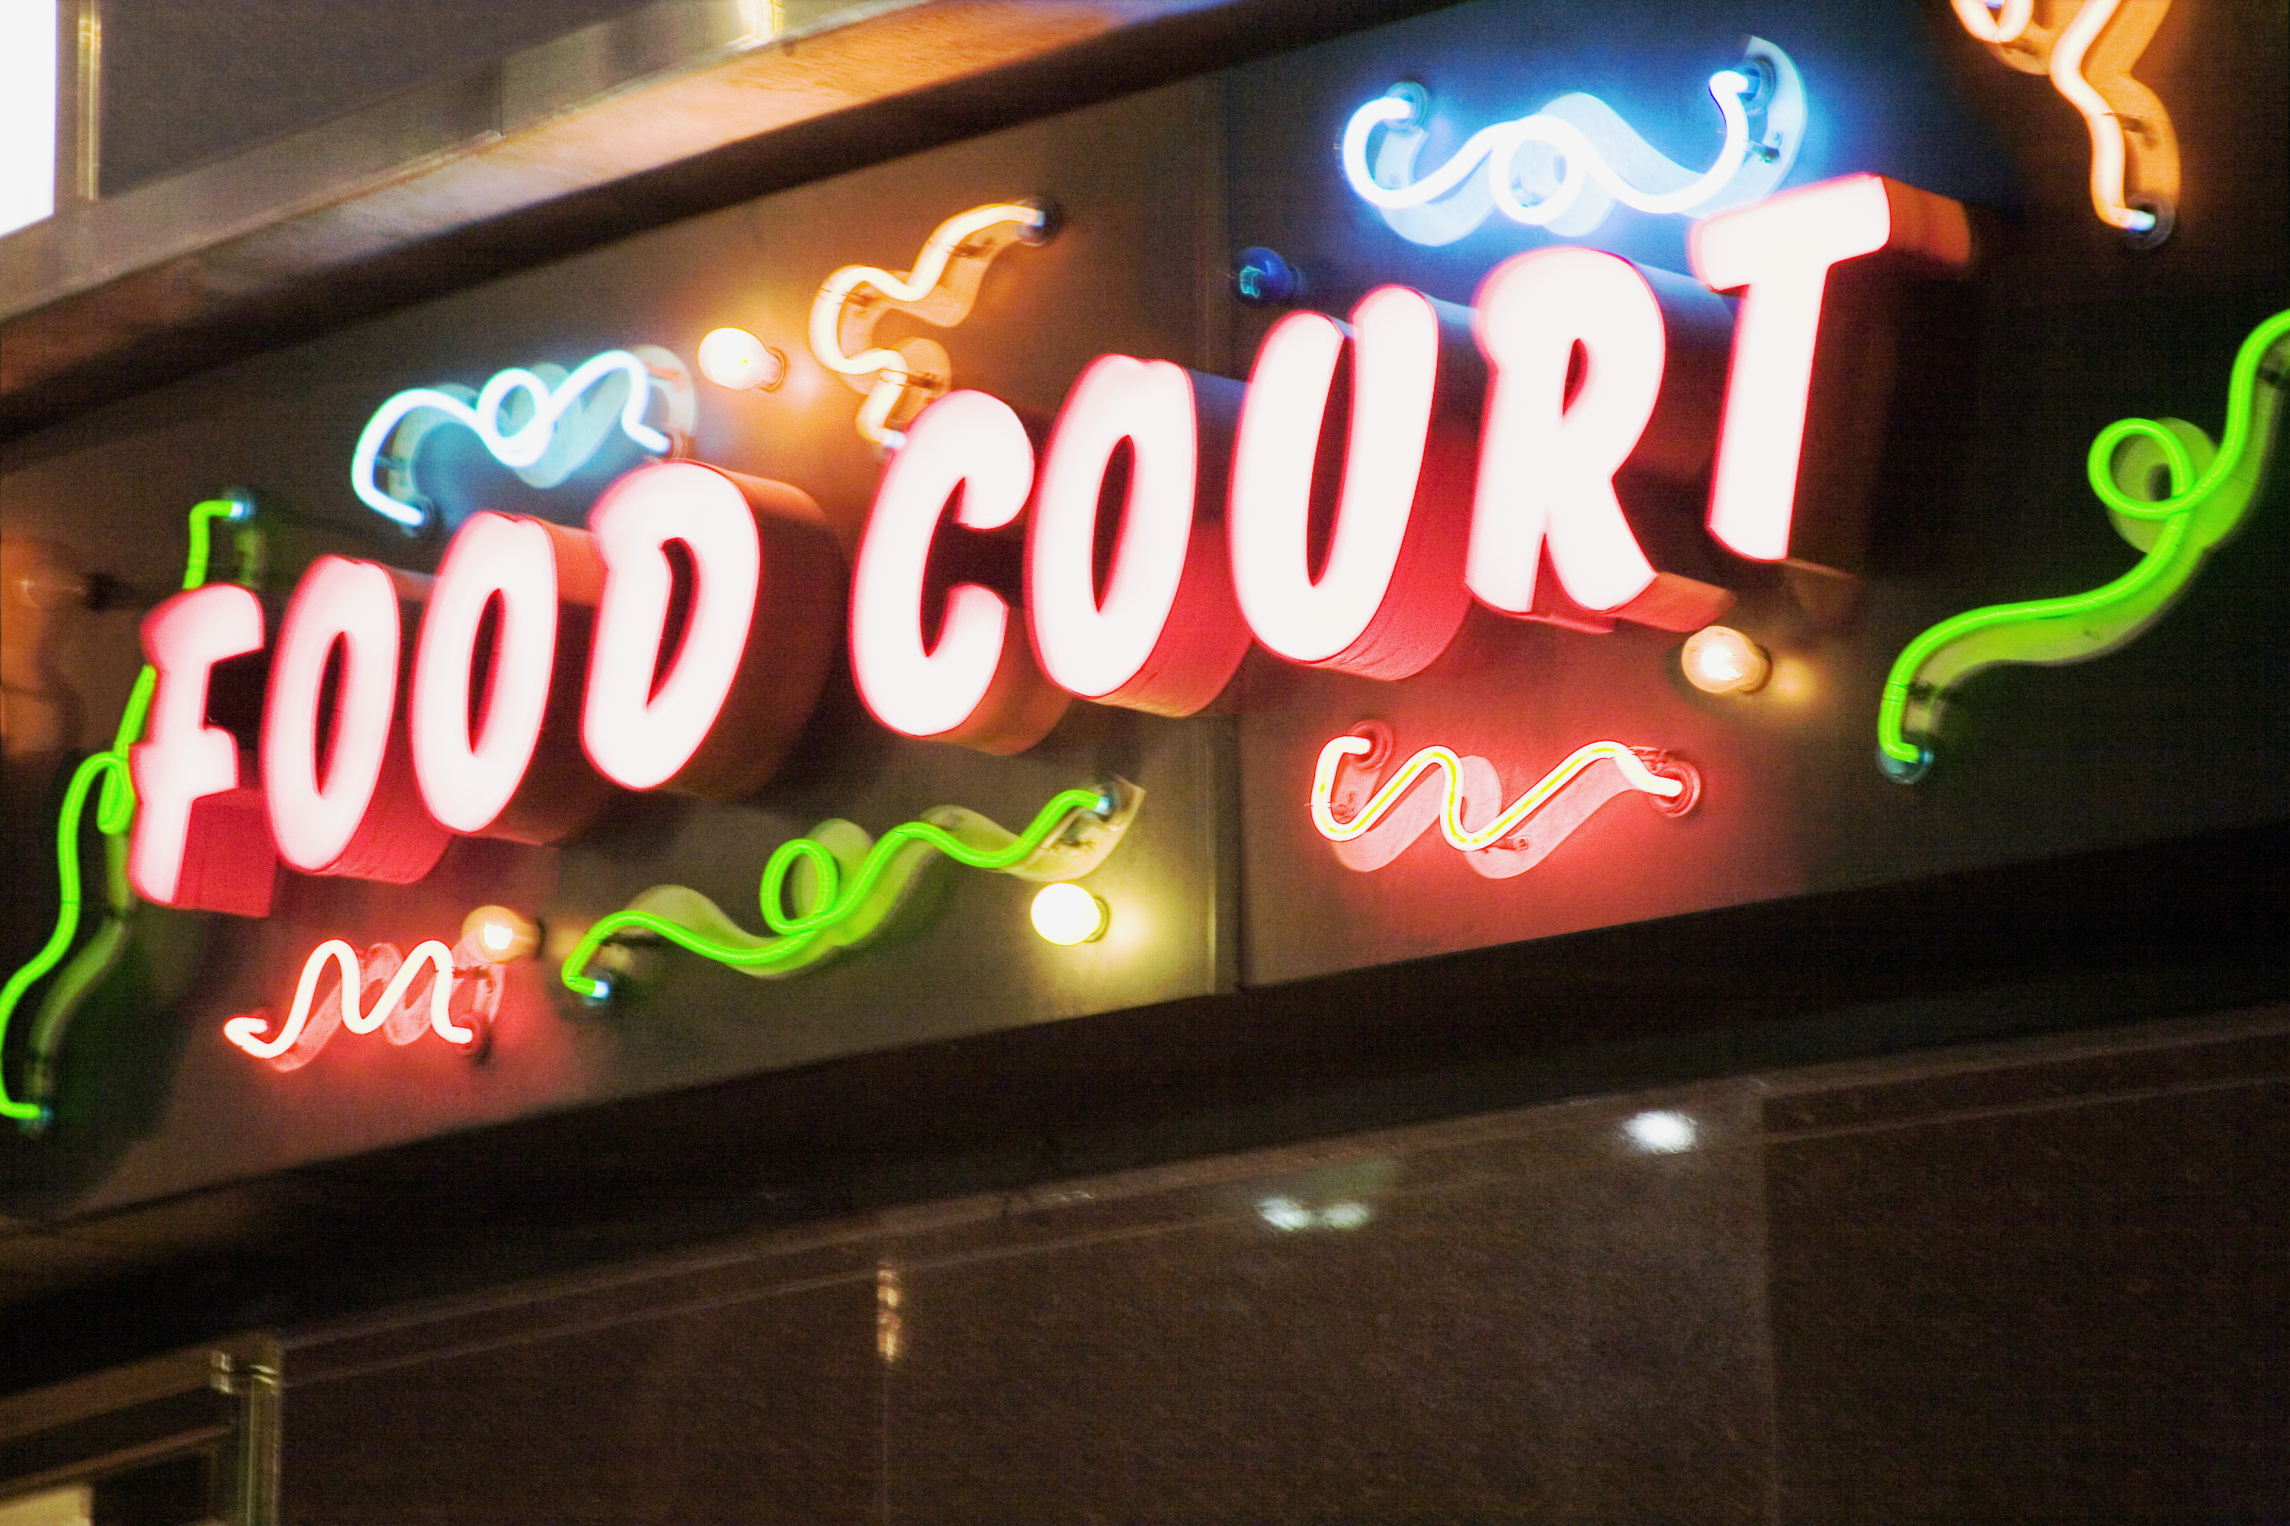 Phipps Food Court